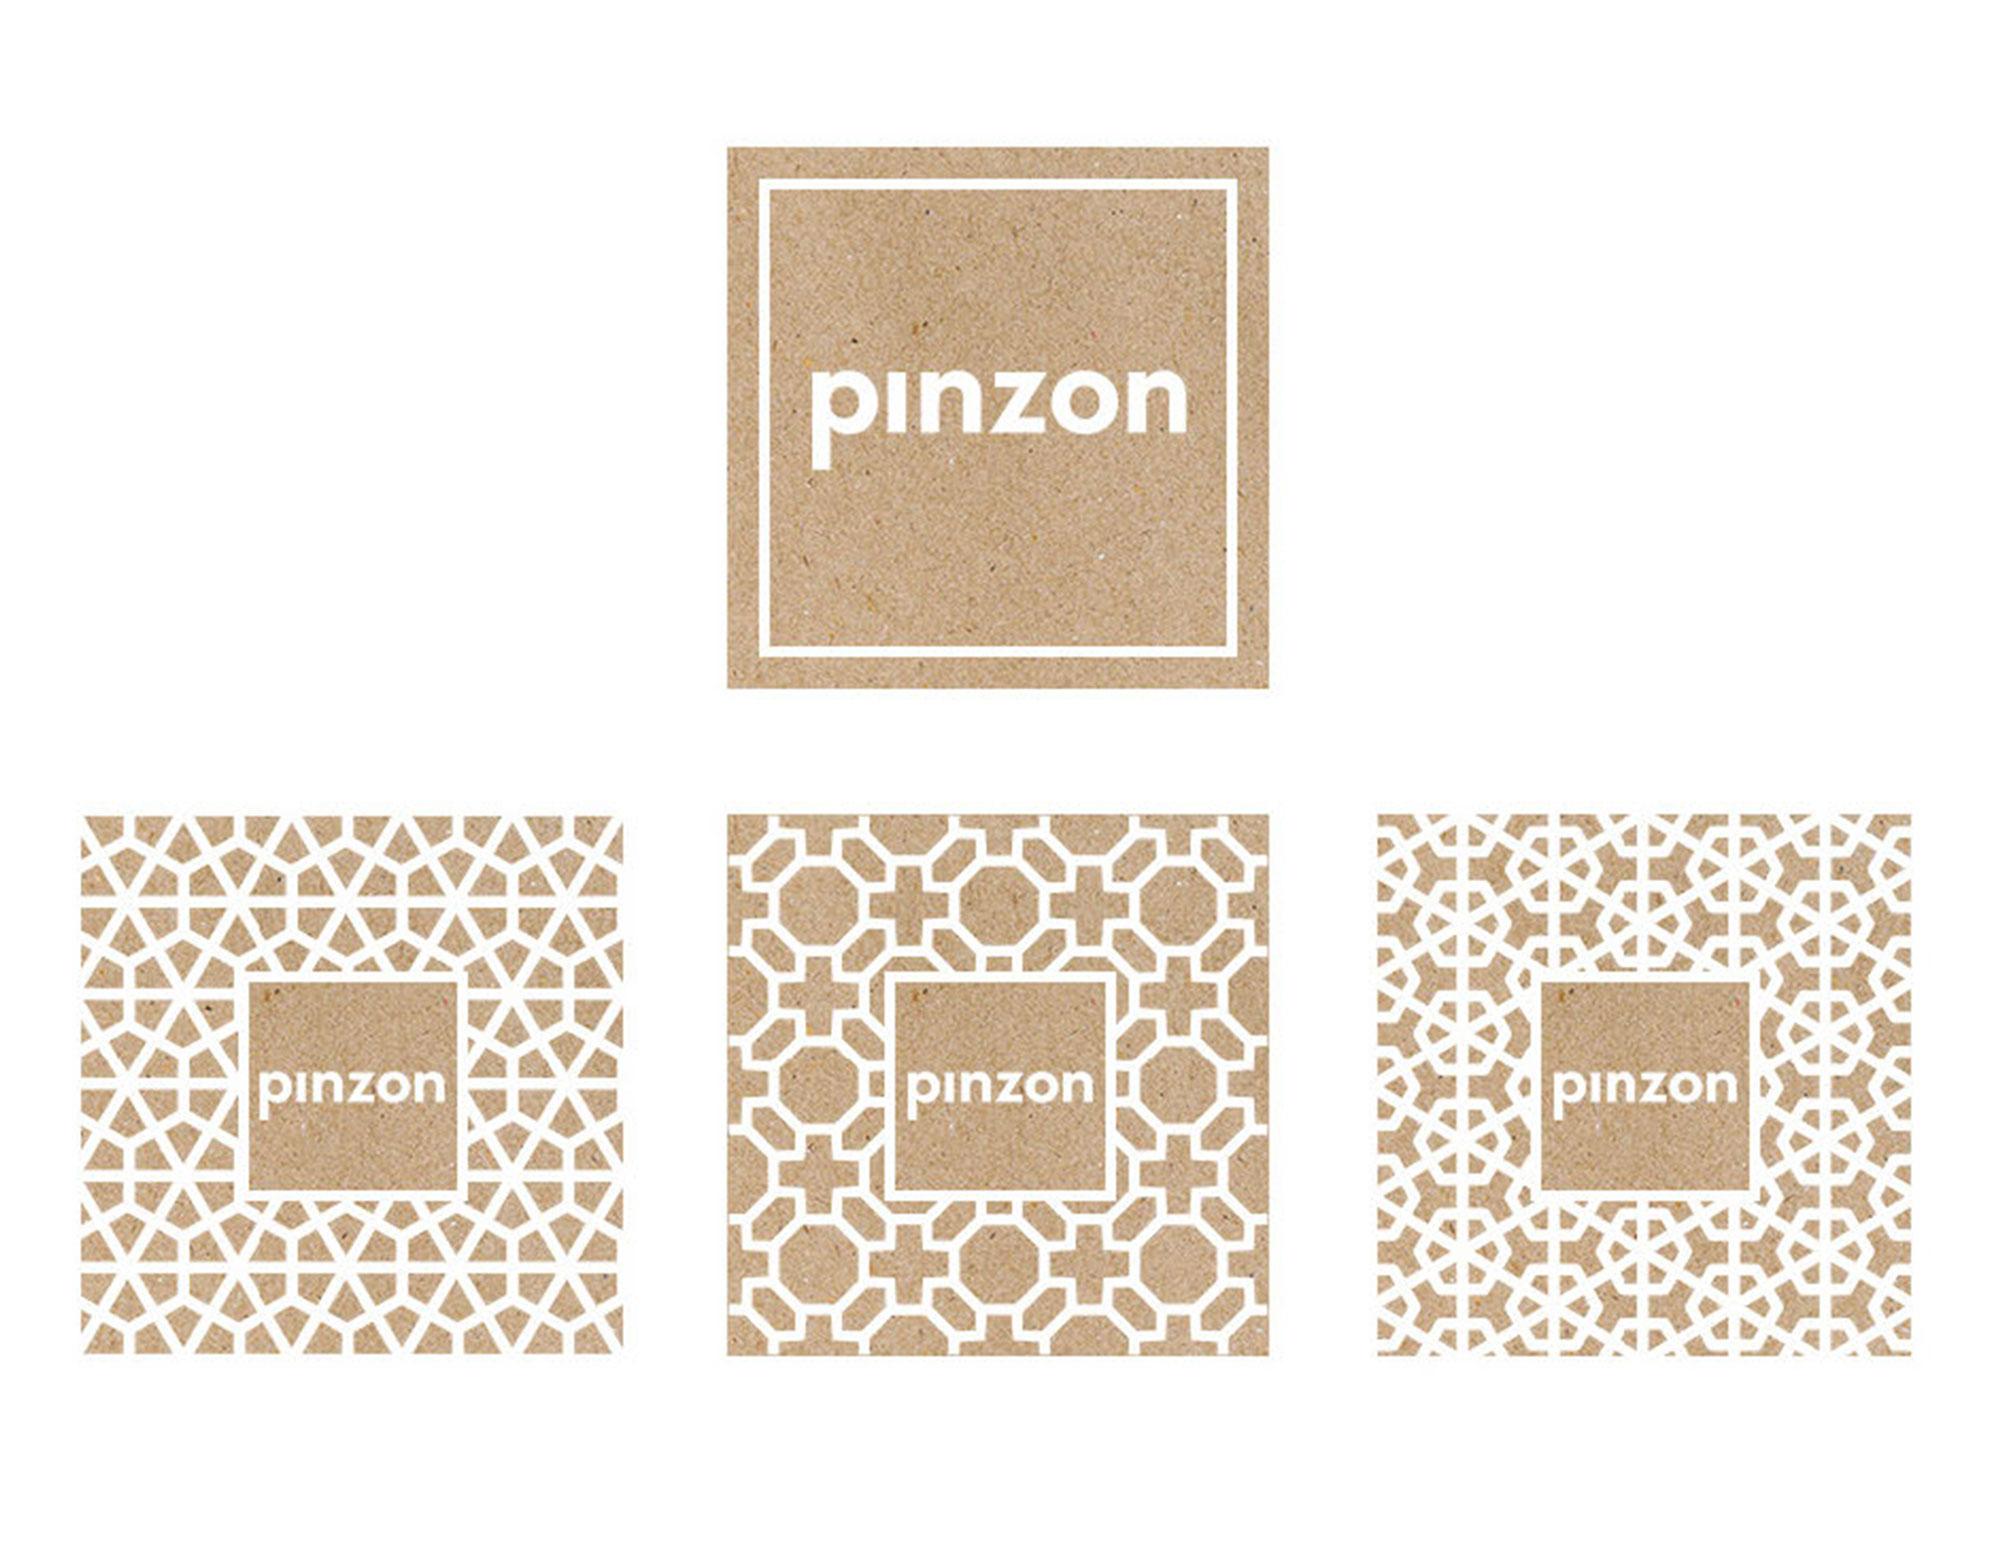 PinzonBranding_v2_020916_Page_19.jpg